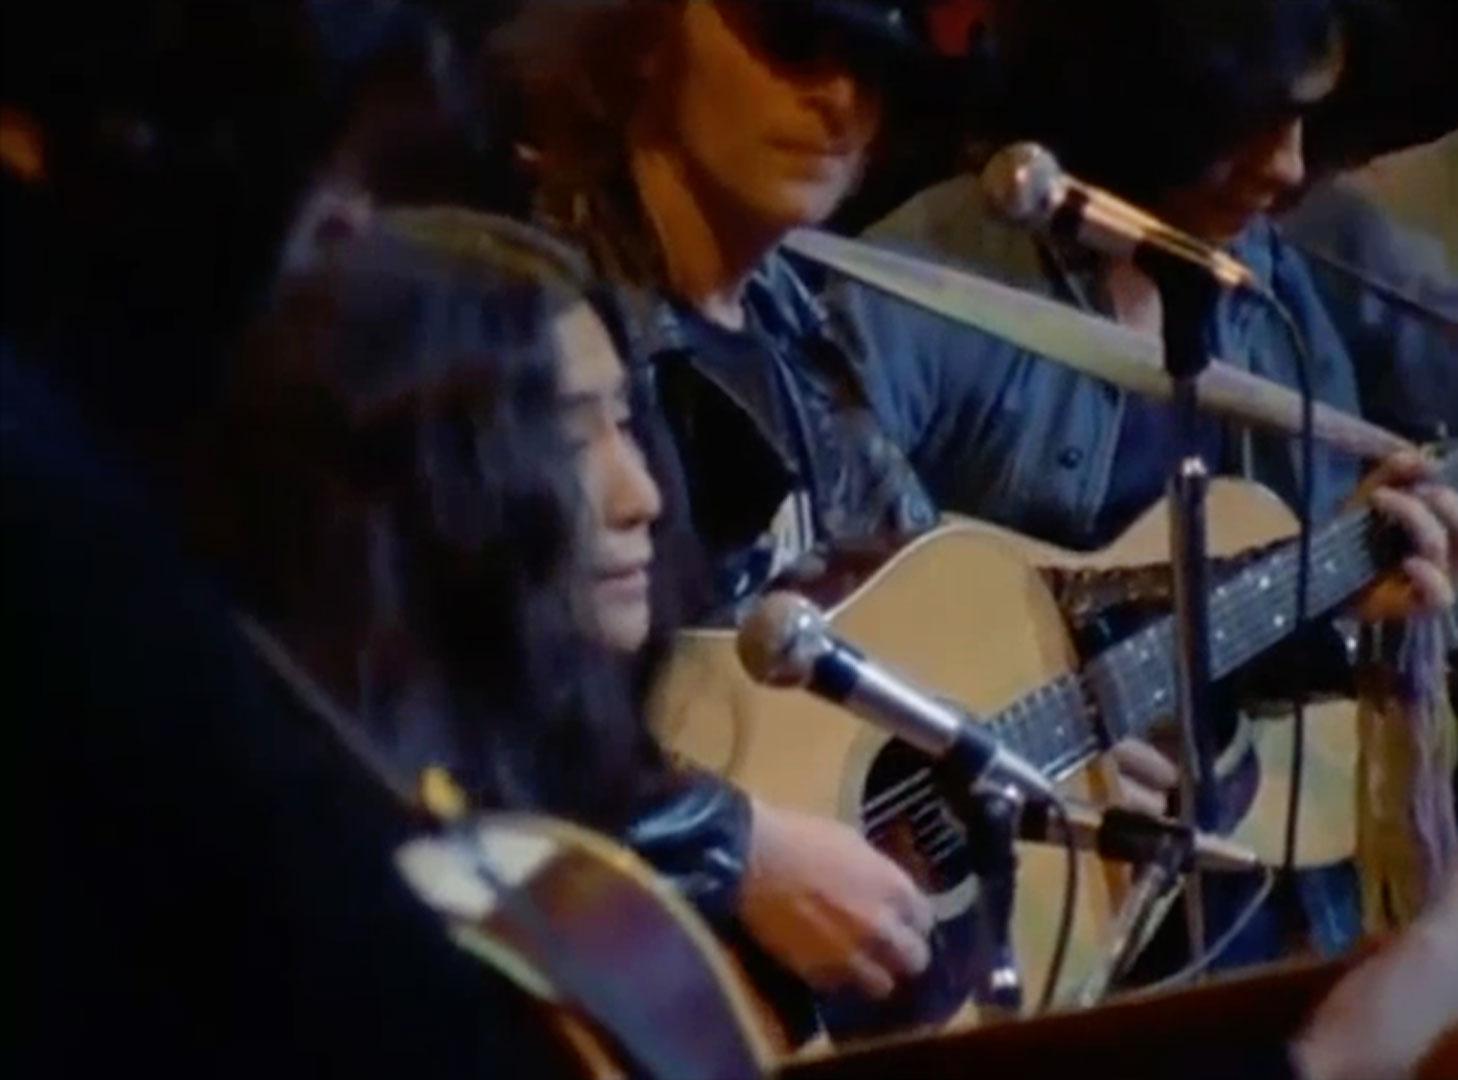 Yoko Ono, Sisters, O Sisters (live at The Apollo Theatre), 1971, John Lennon & Yoko Ono